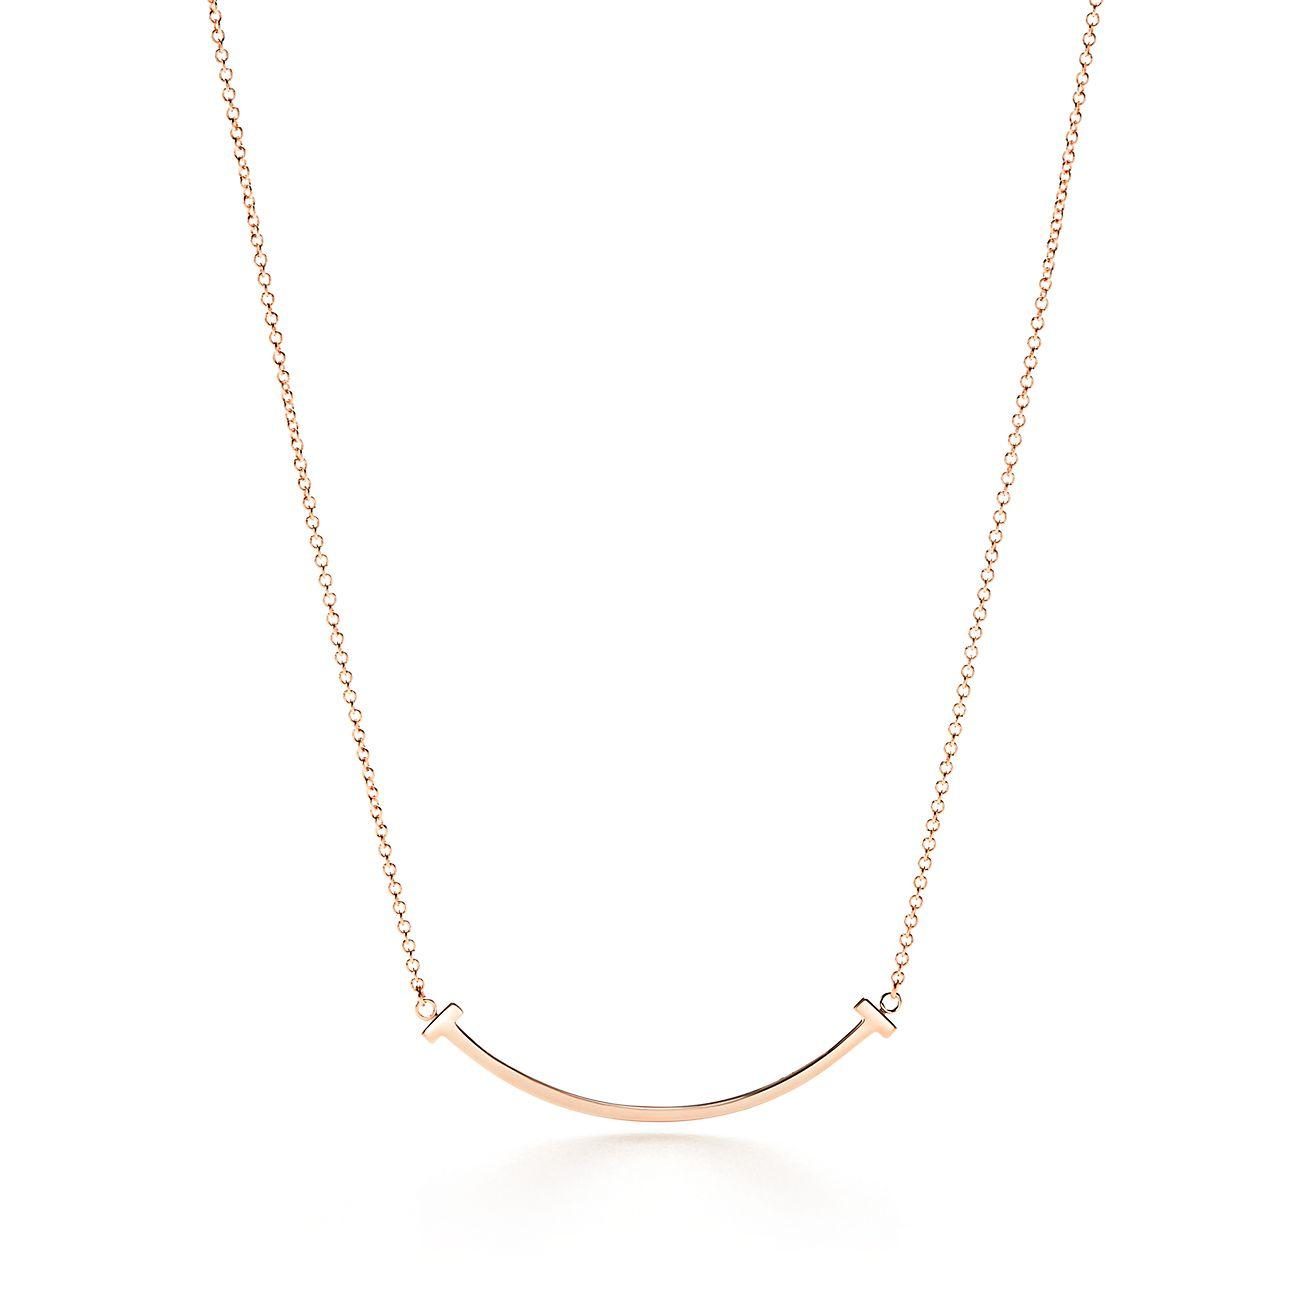 Tiffany Infinity pendant in 18k rose gold, mini Tiffany & Co.